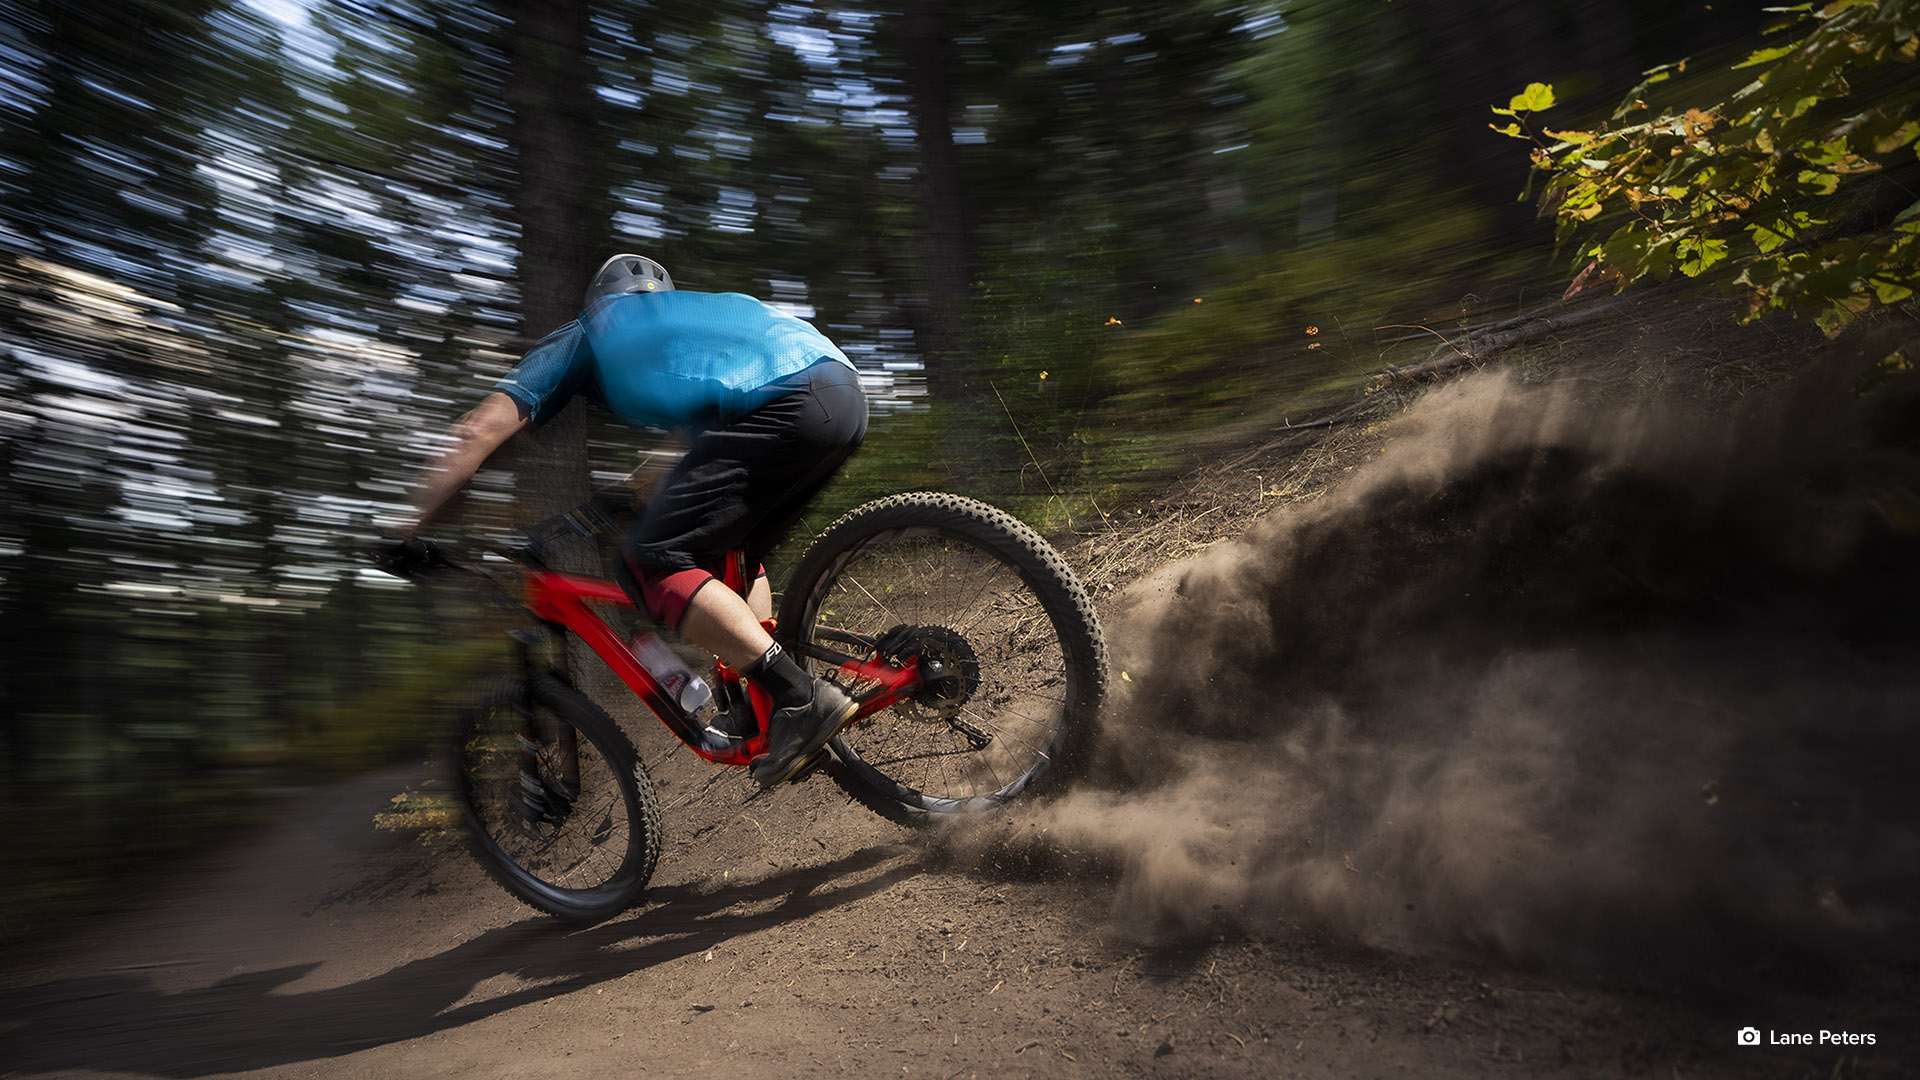 Rider: Austin Tucker Photographer: Lane Peters